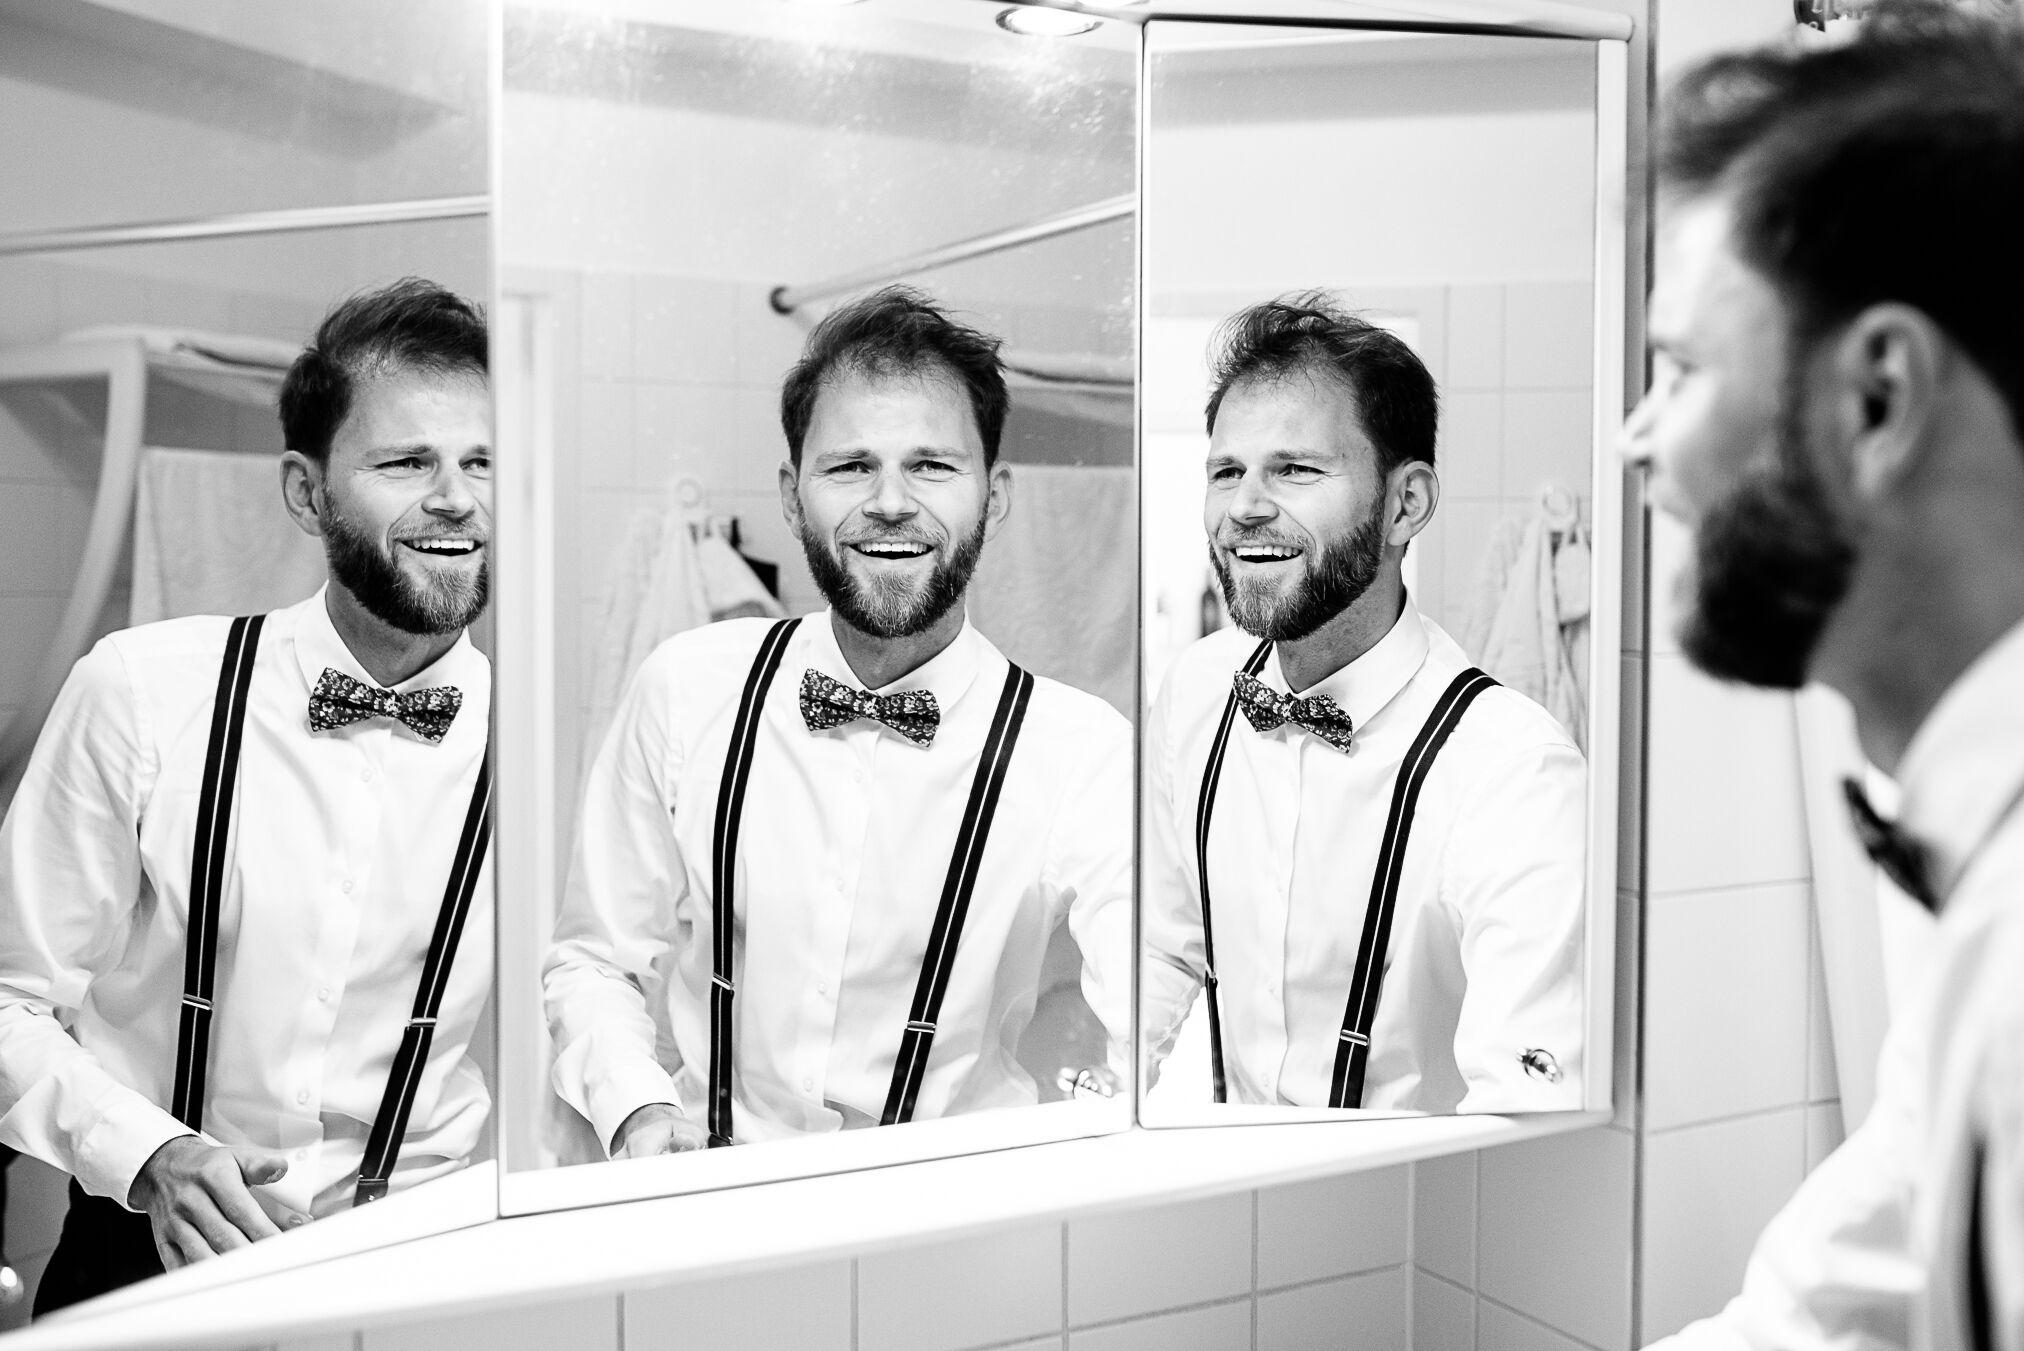 Hochzeit-Salonplafond-LukasBezila